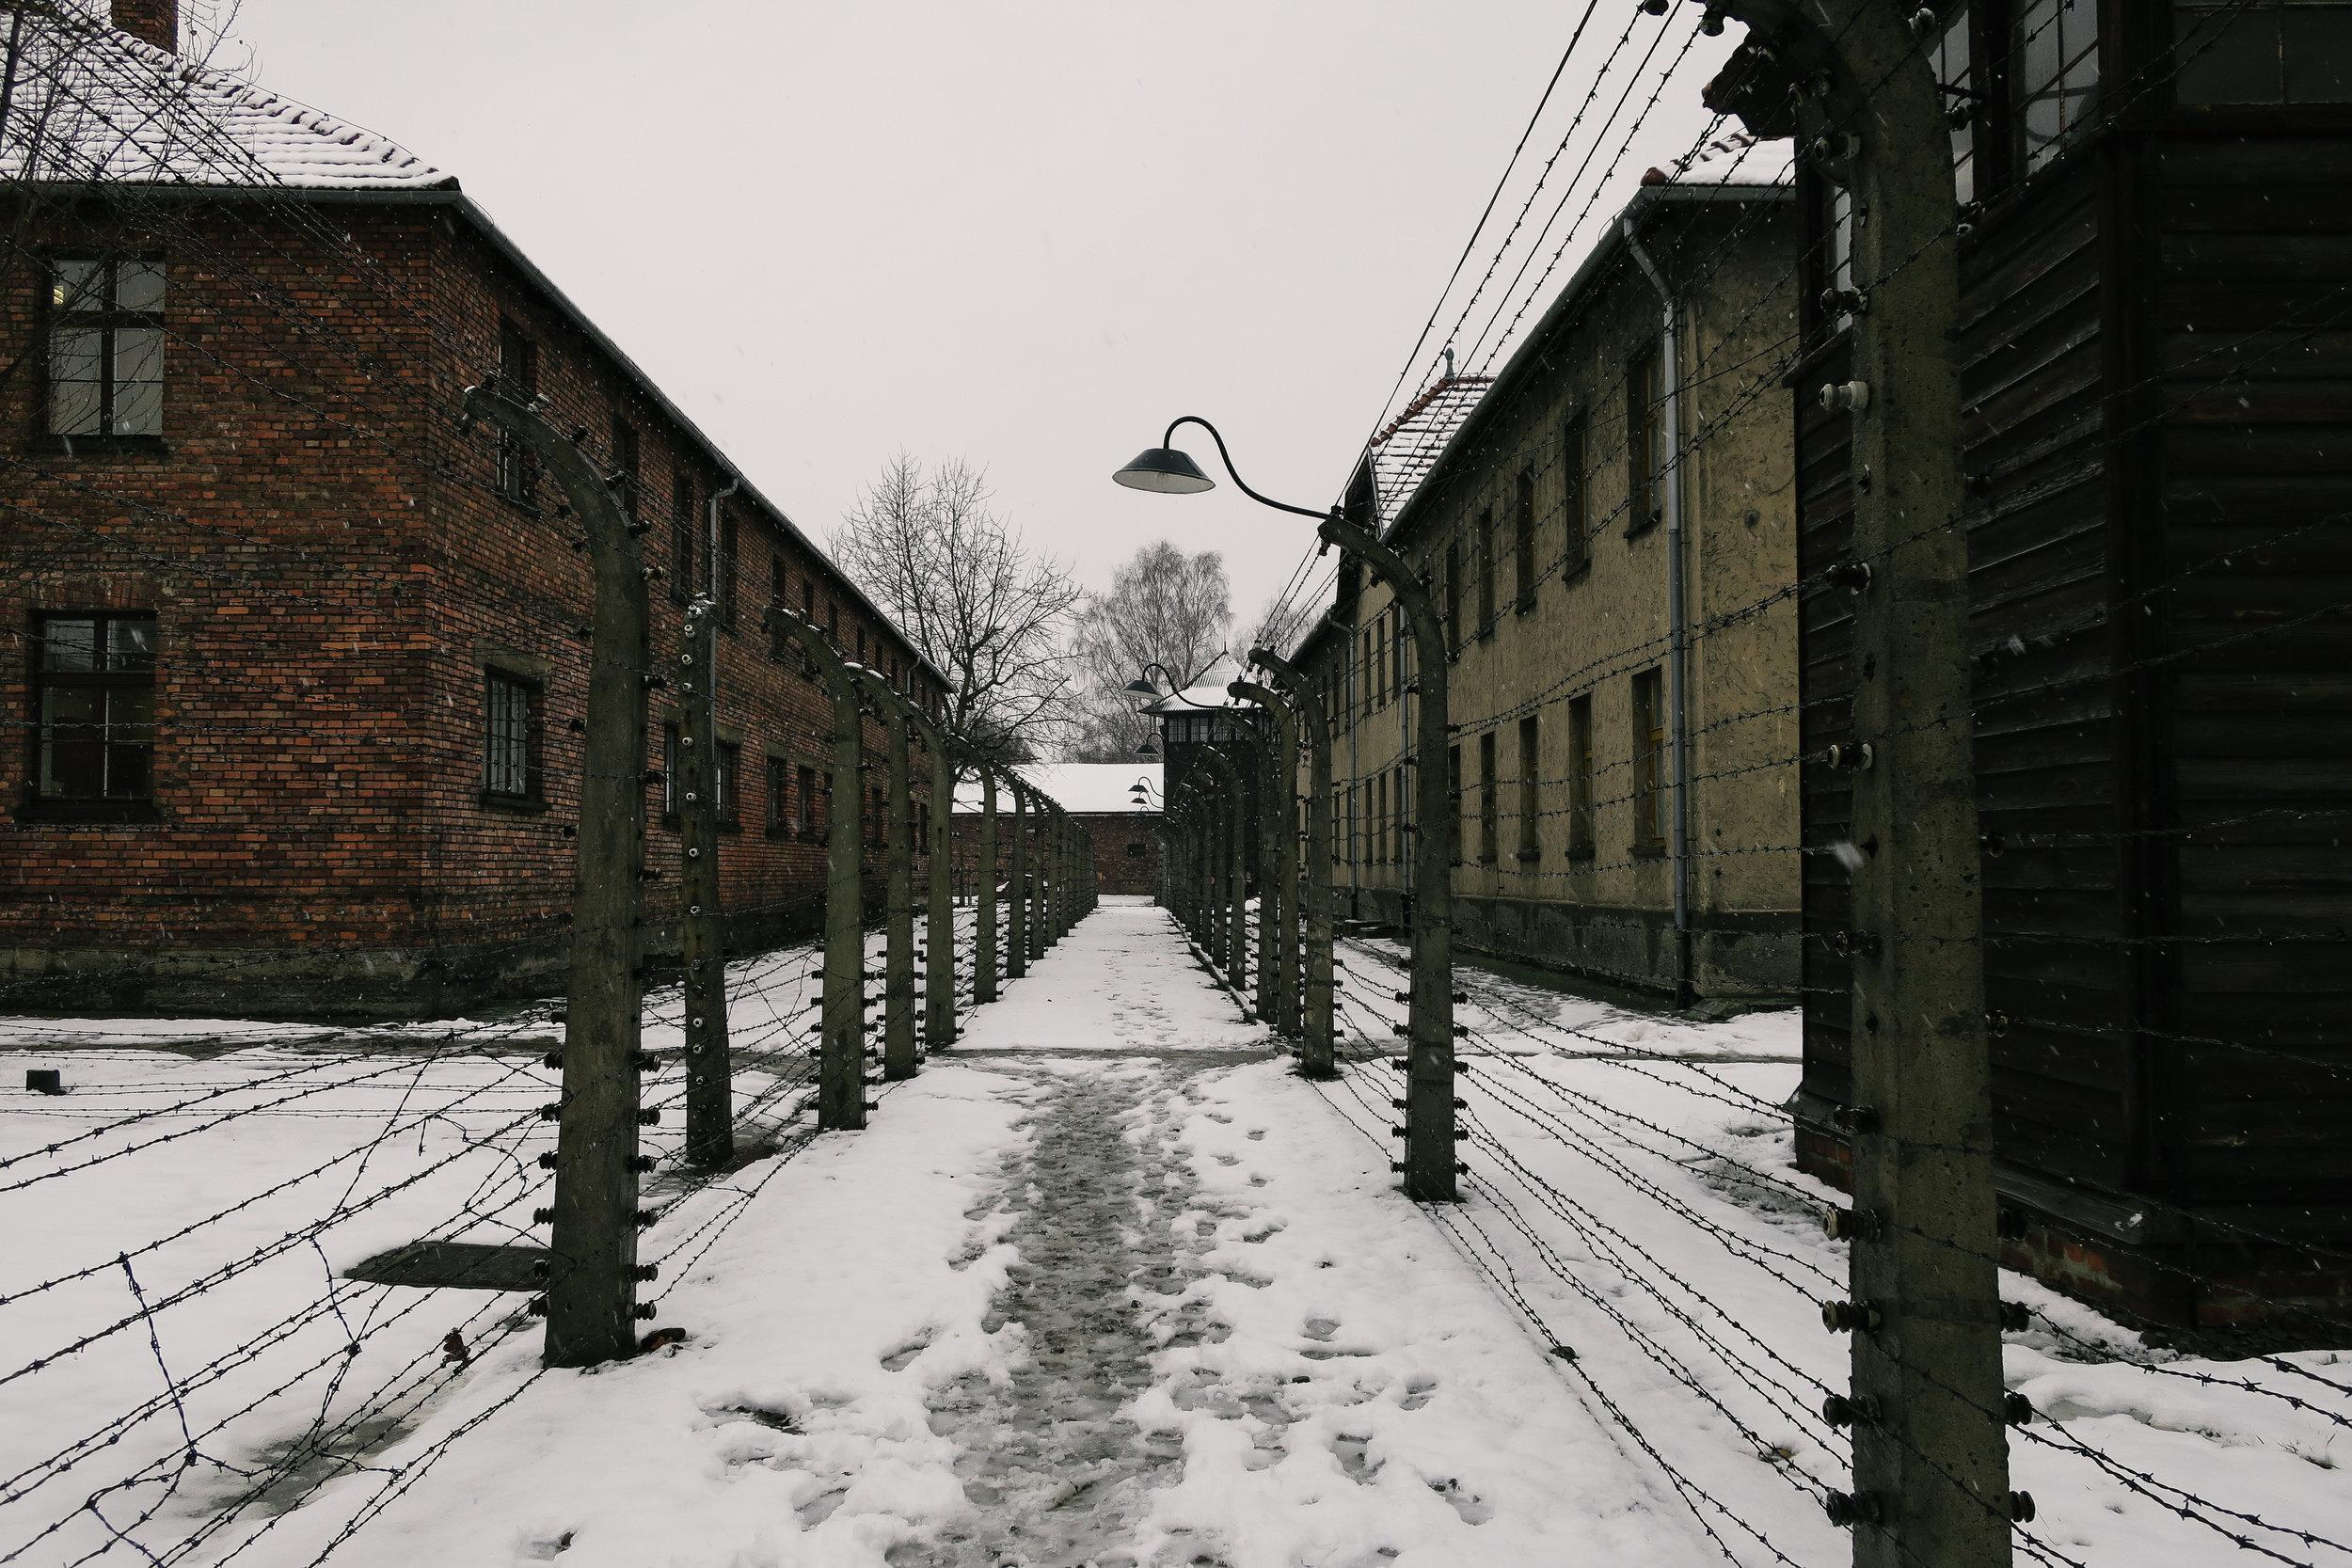 aushwitz-krakow-poland-travel-guide-lifeonpin_IMG_0212.jpg